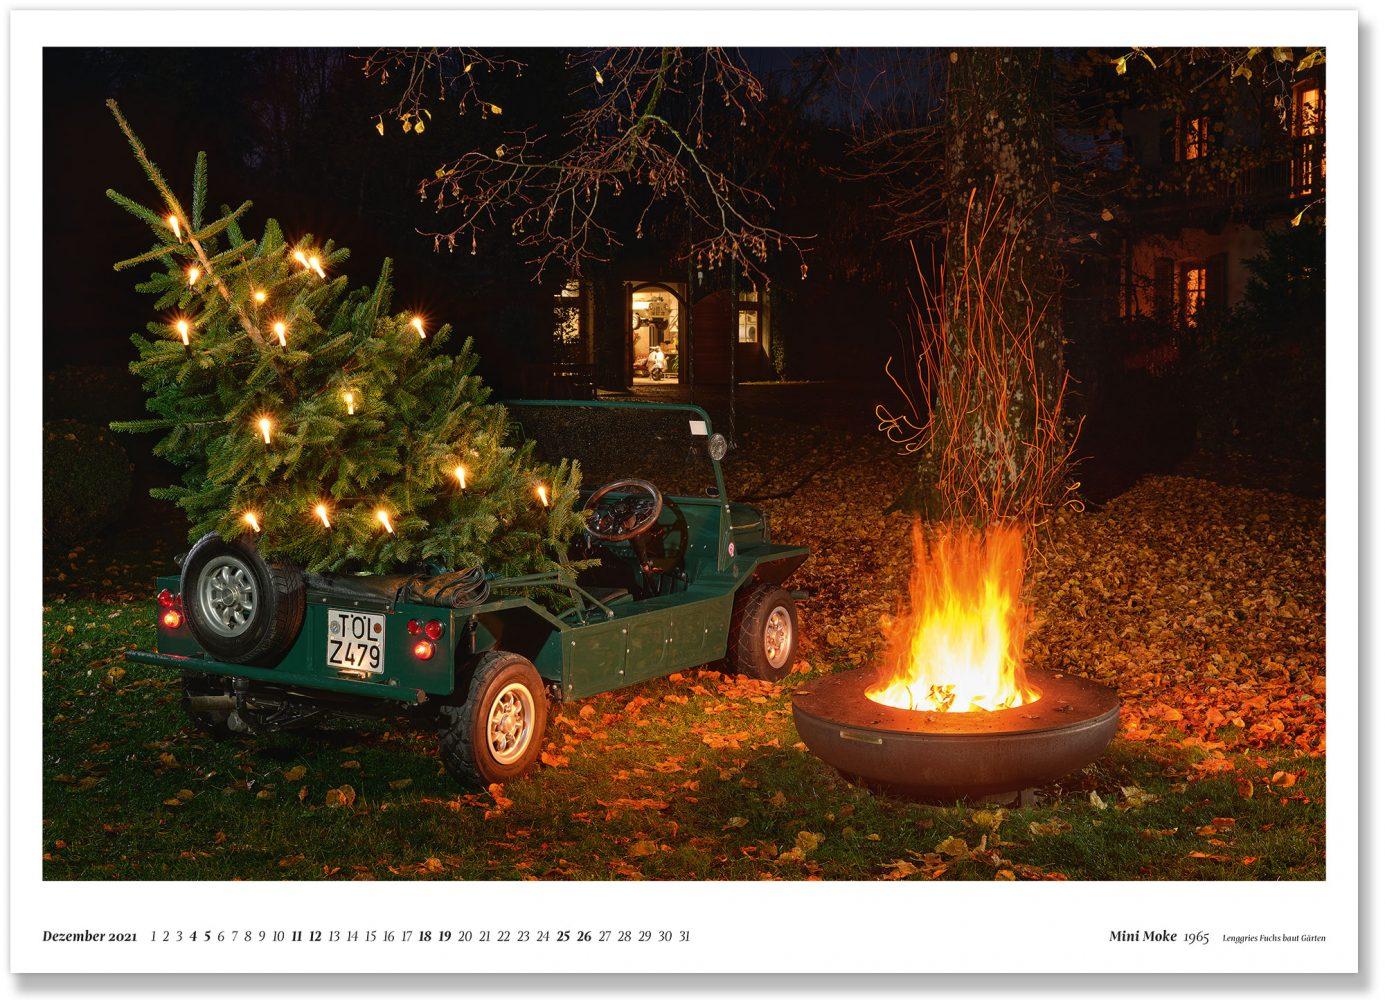 Mini Moke 1965 Lenggries Fuchs baut Gärten